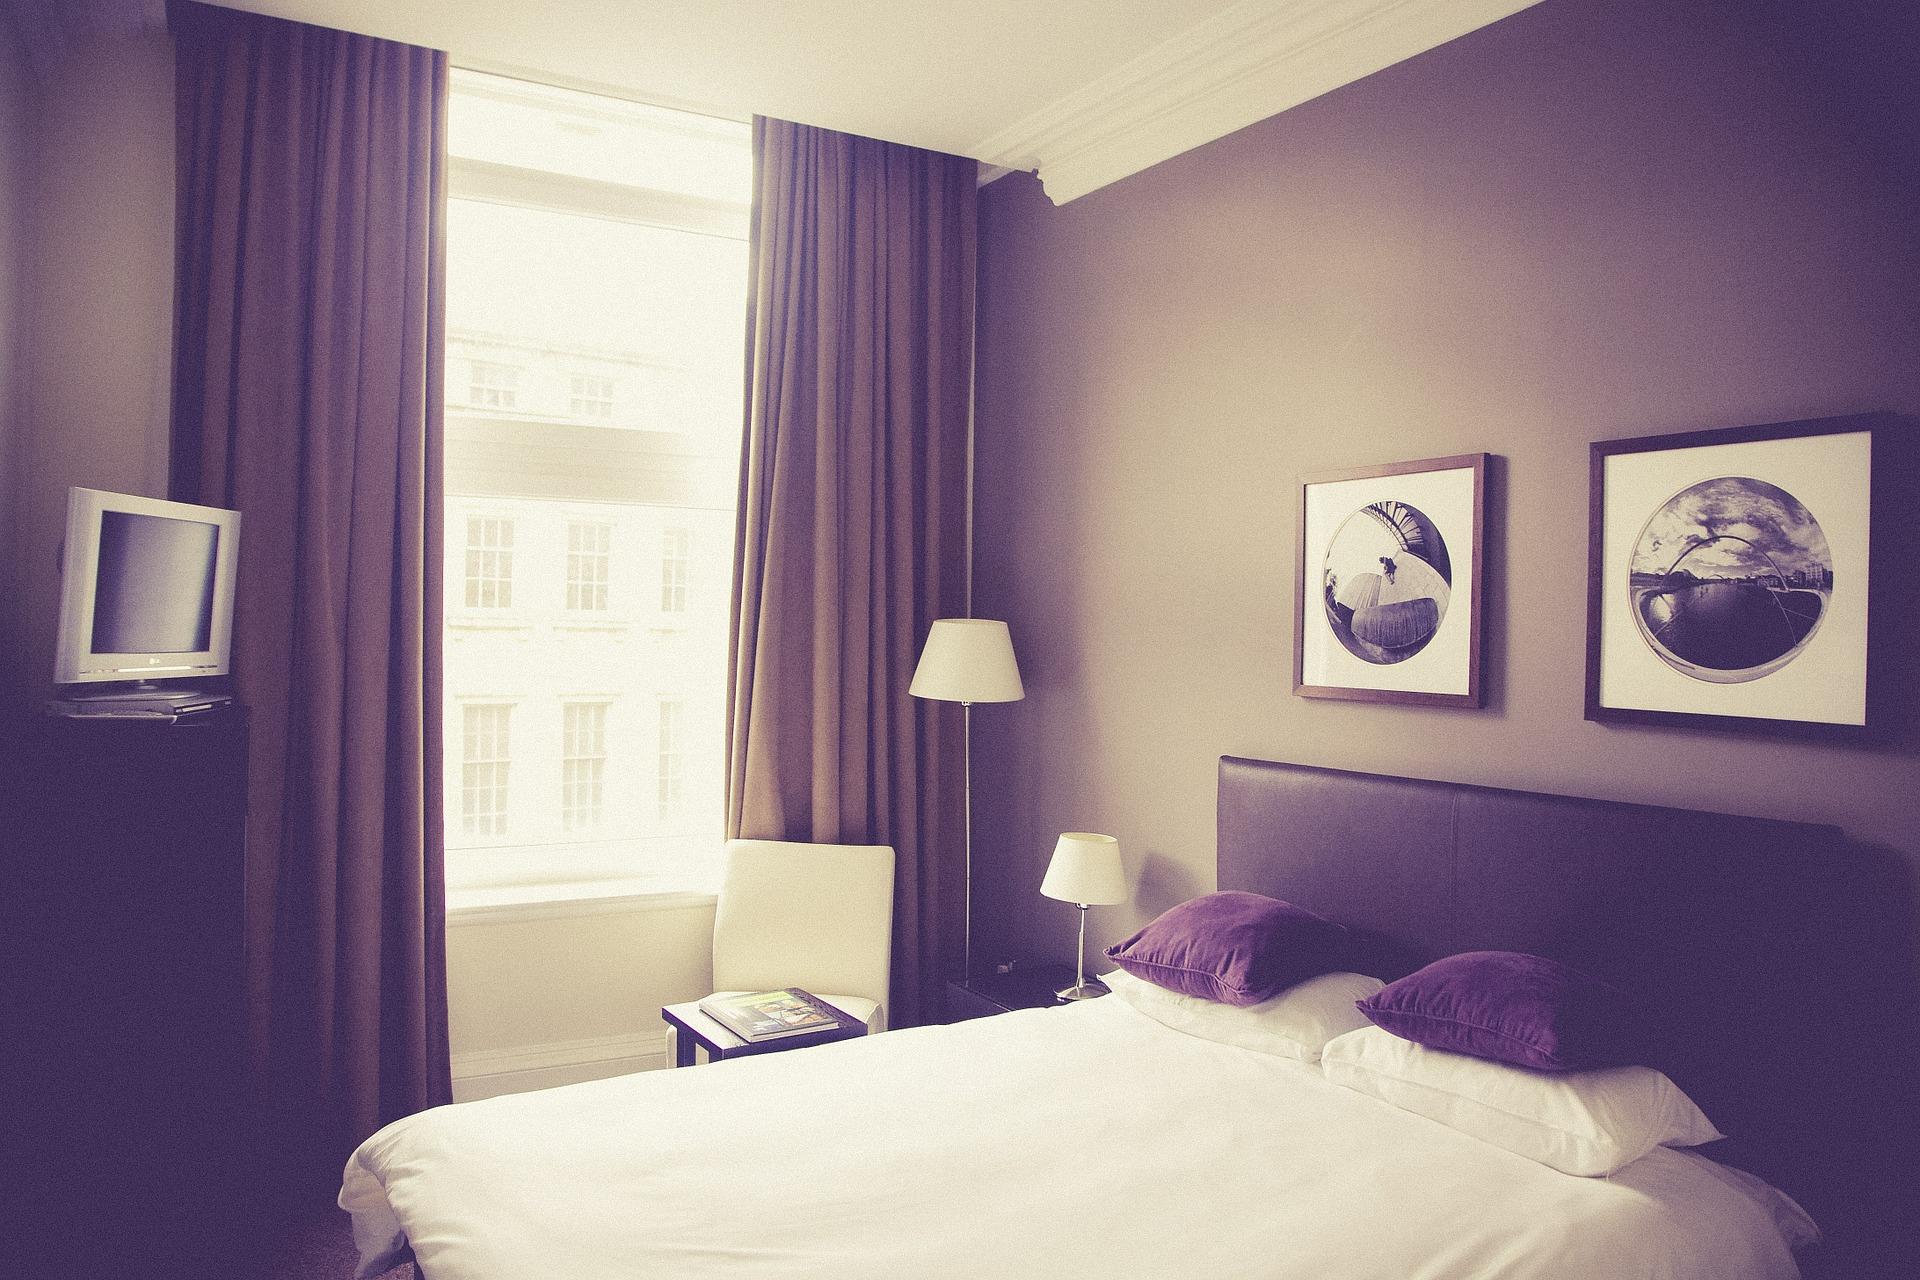 Hébergement hôtelier